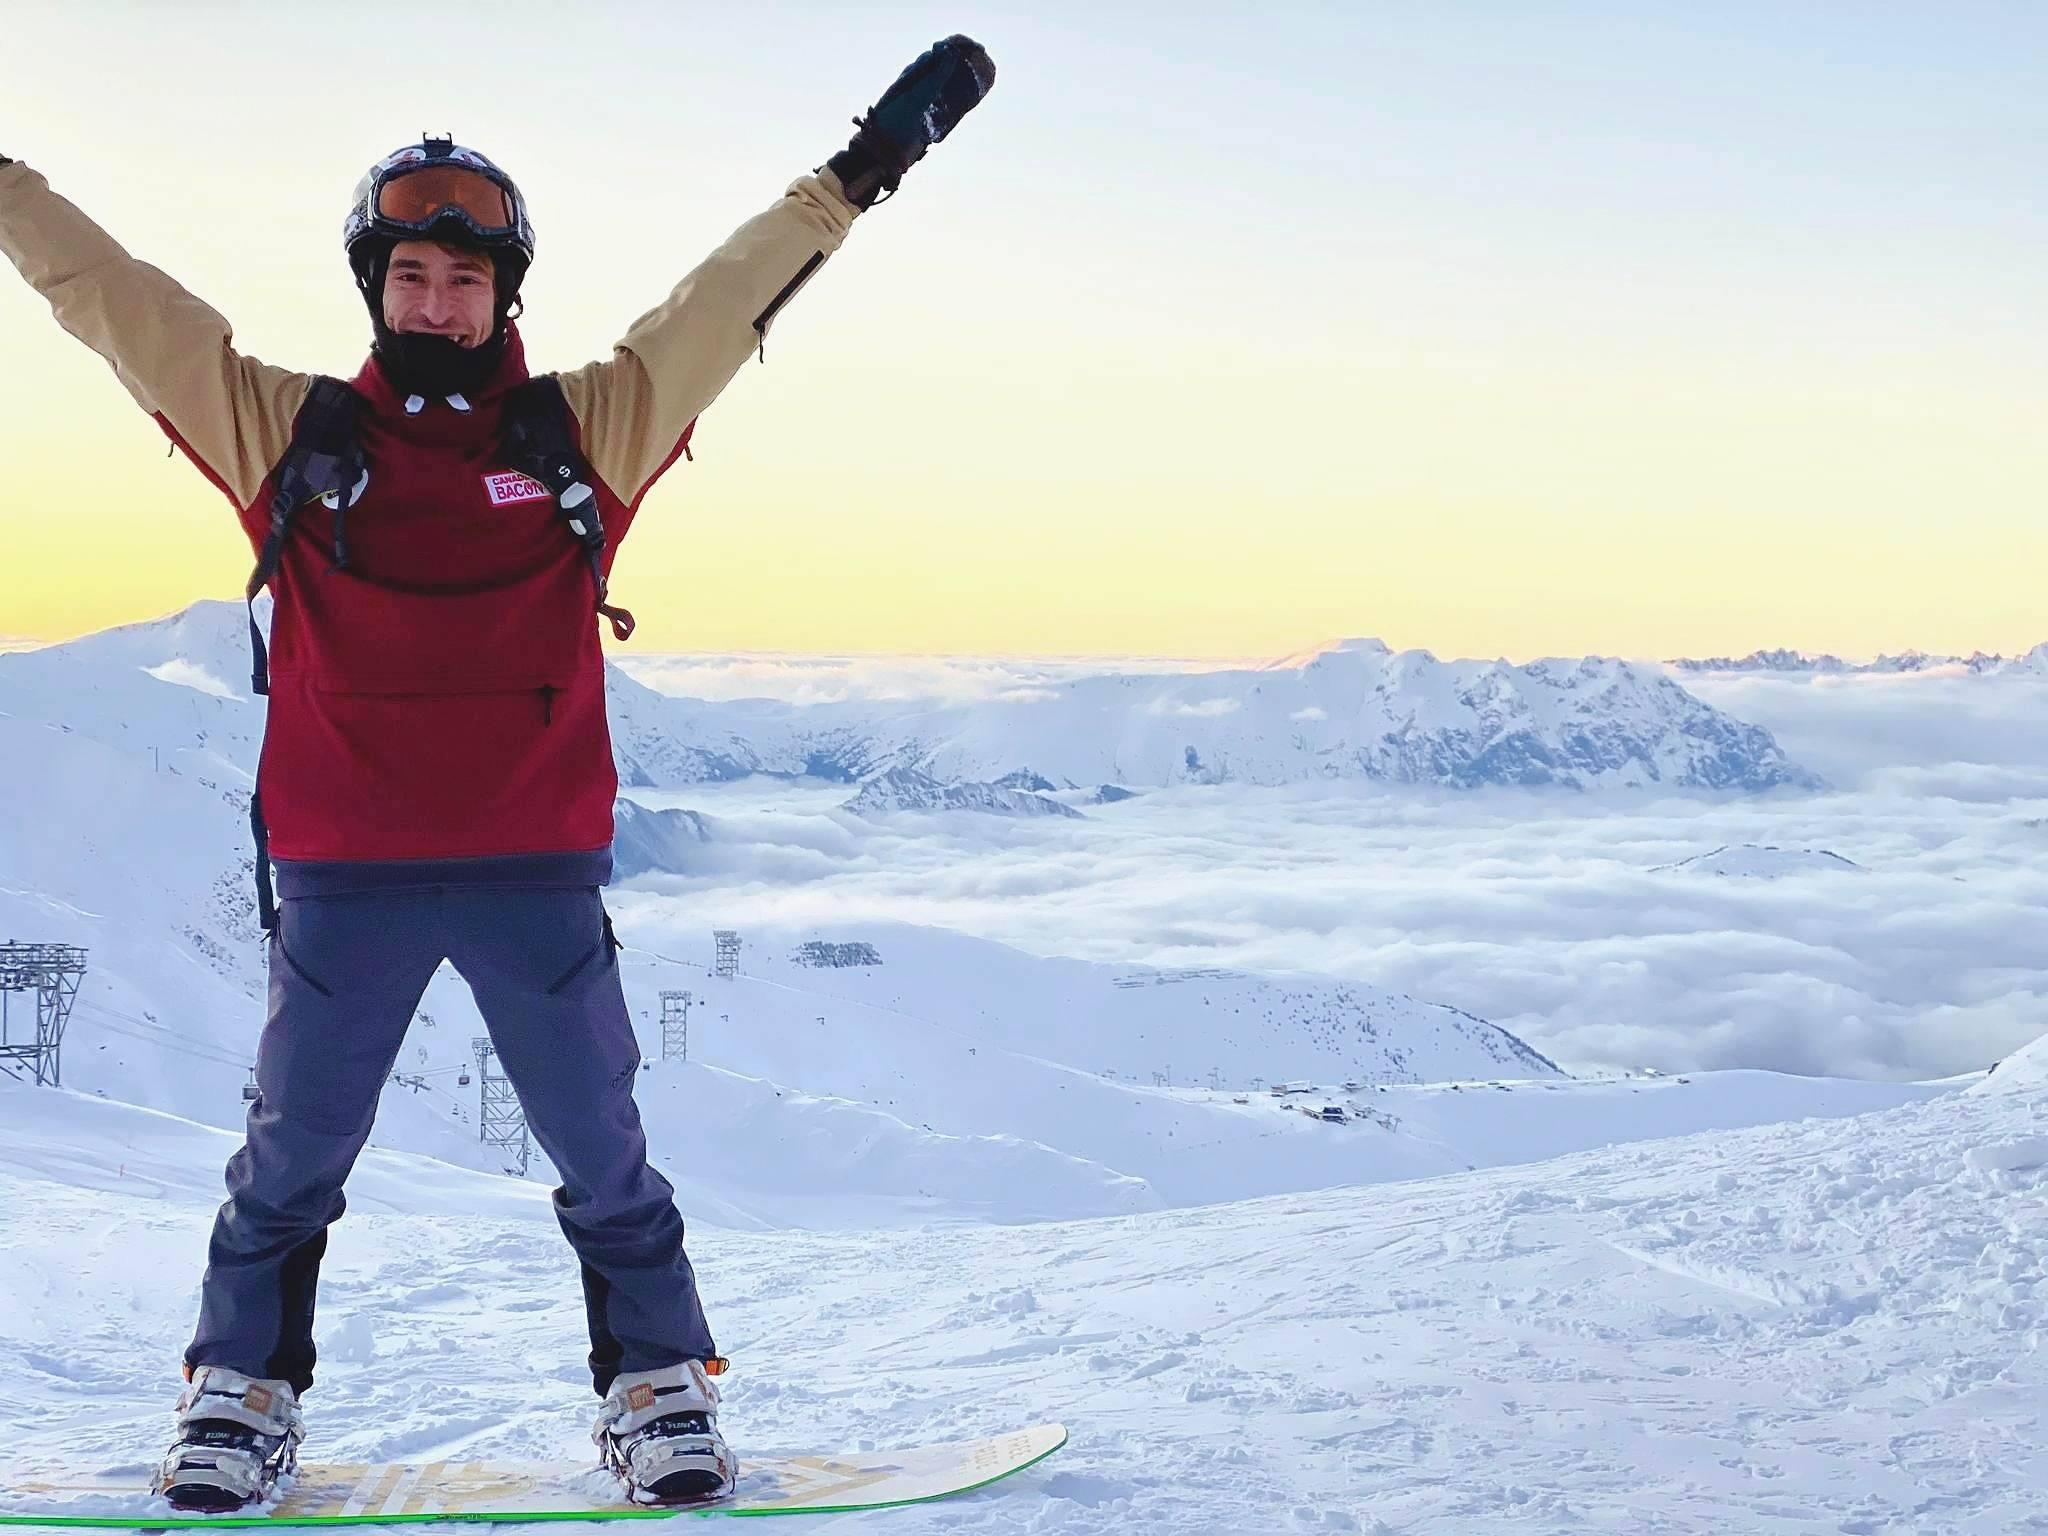 goofy snowboard